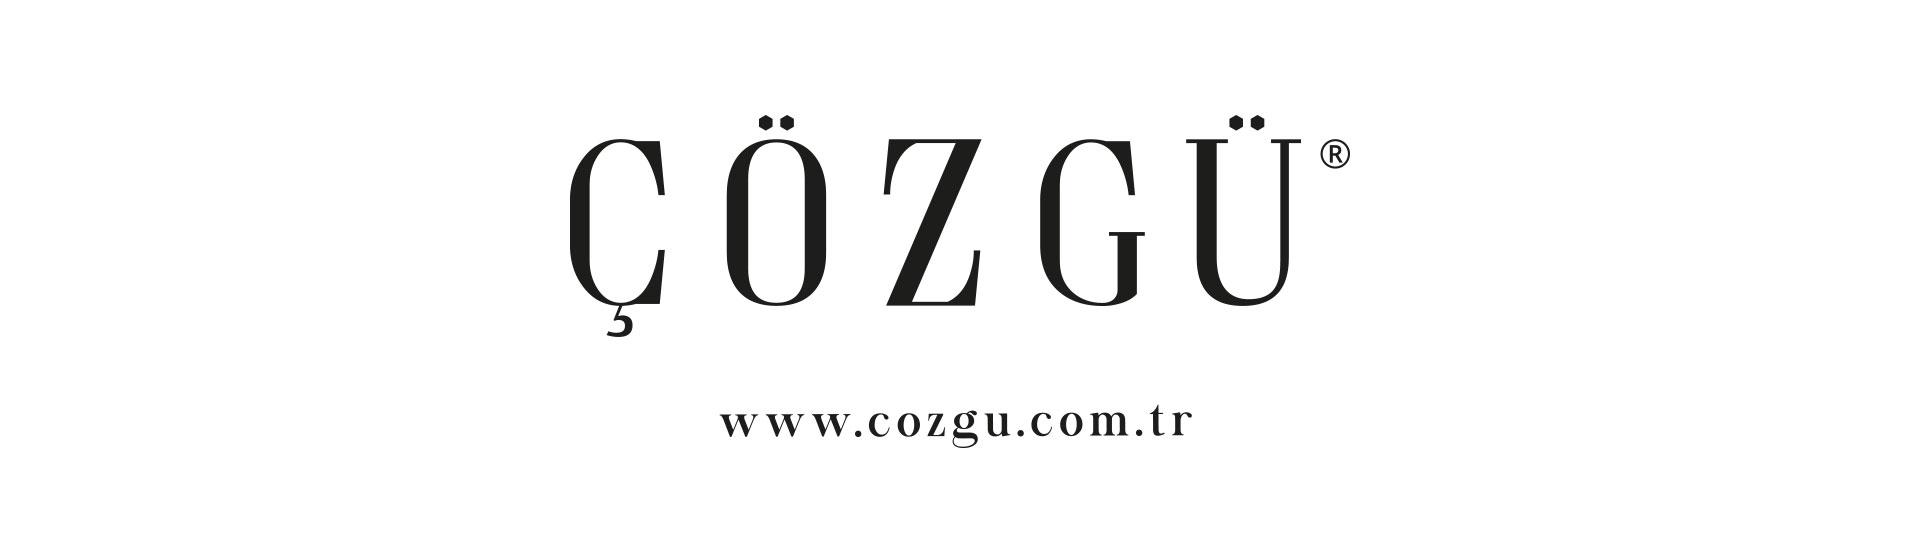 çözgü tekstil logo